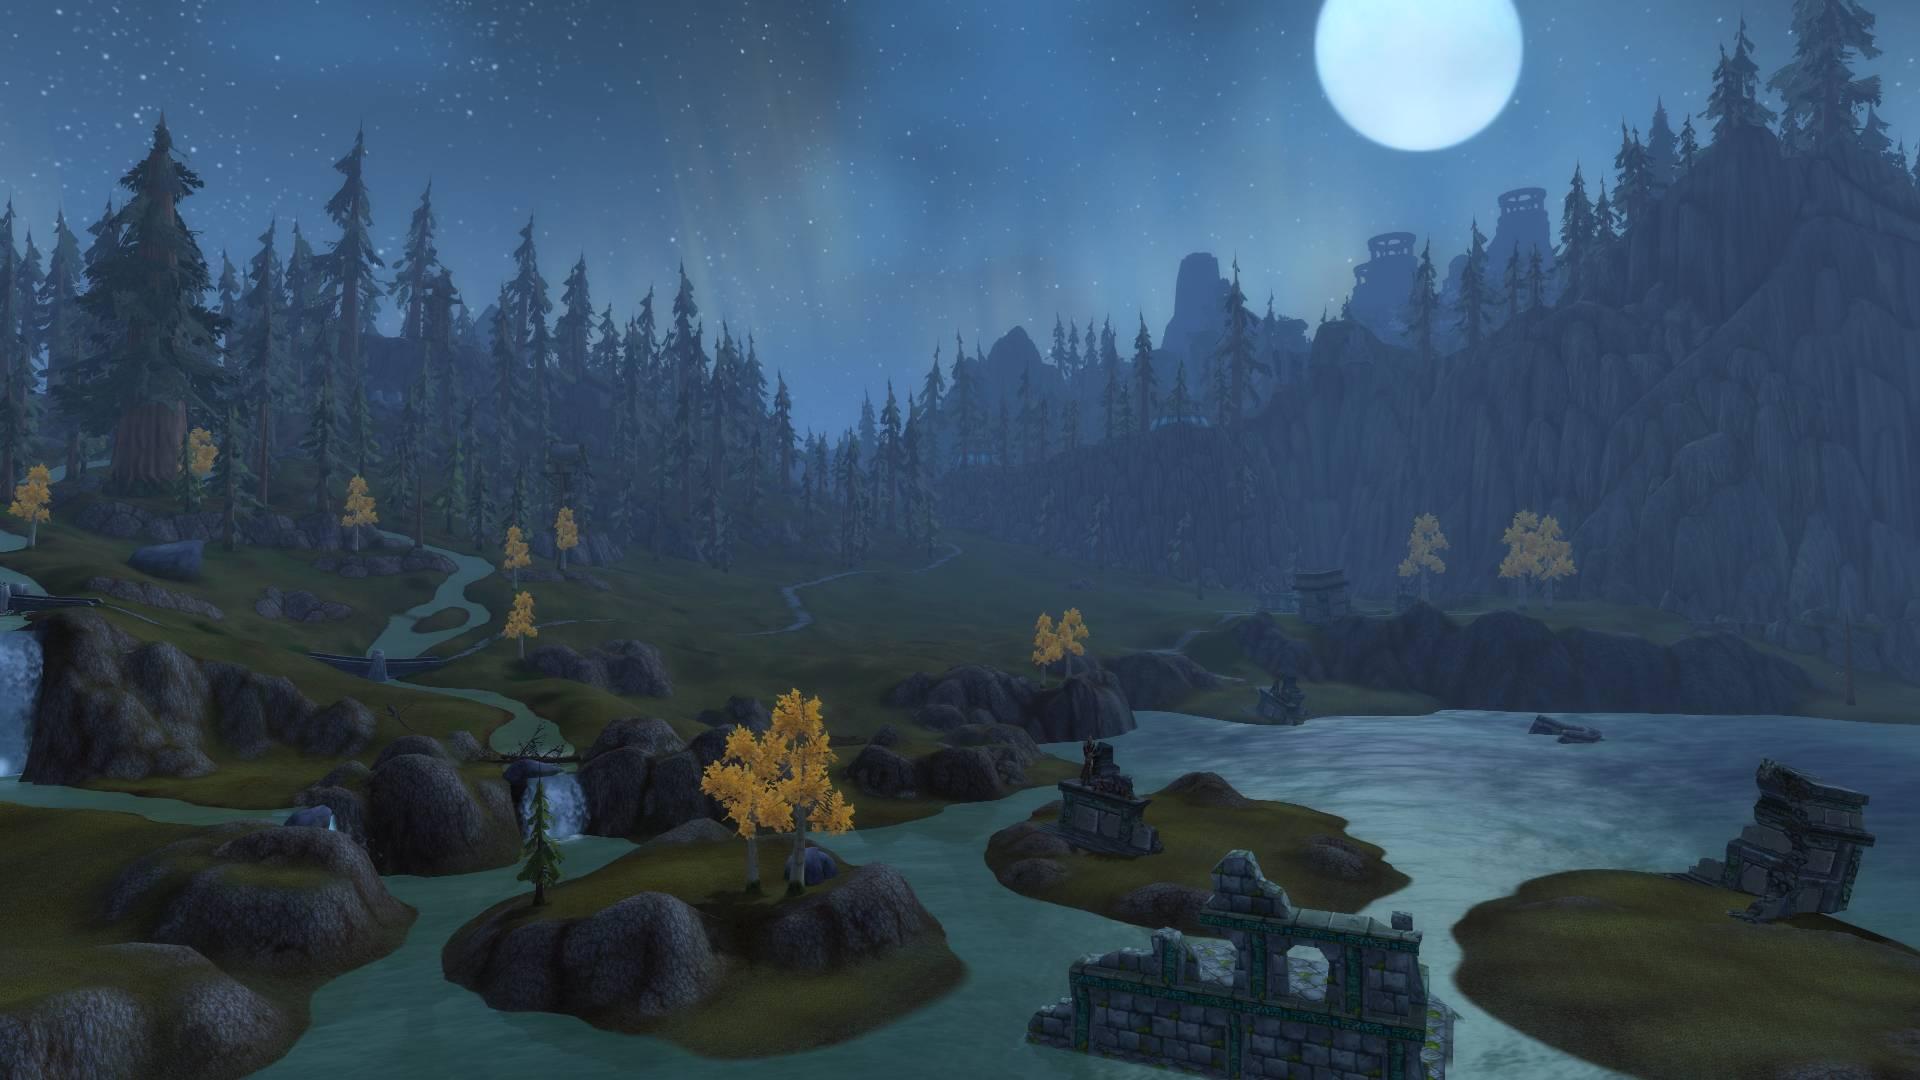 World of warcraft ports smut scene